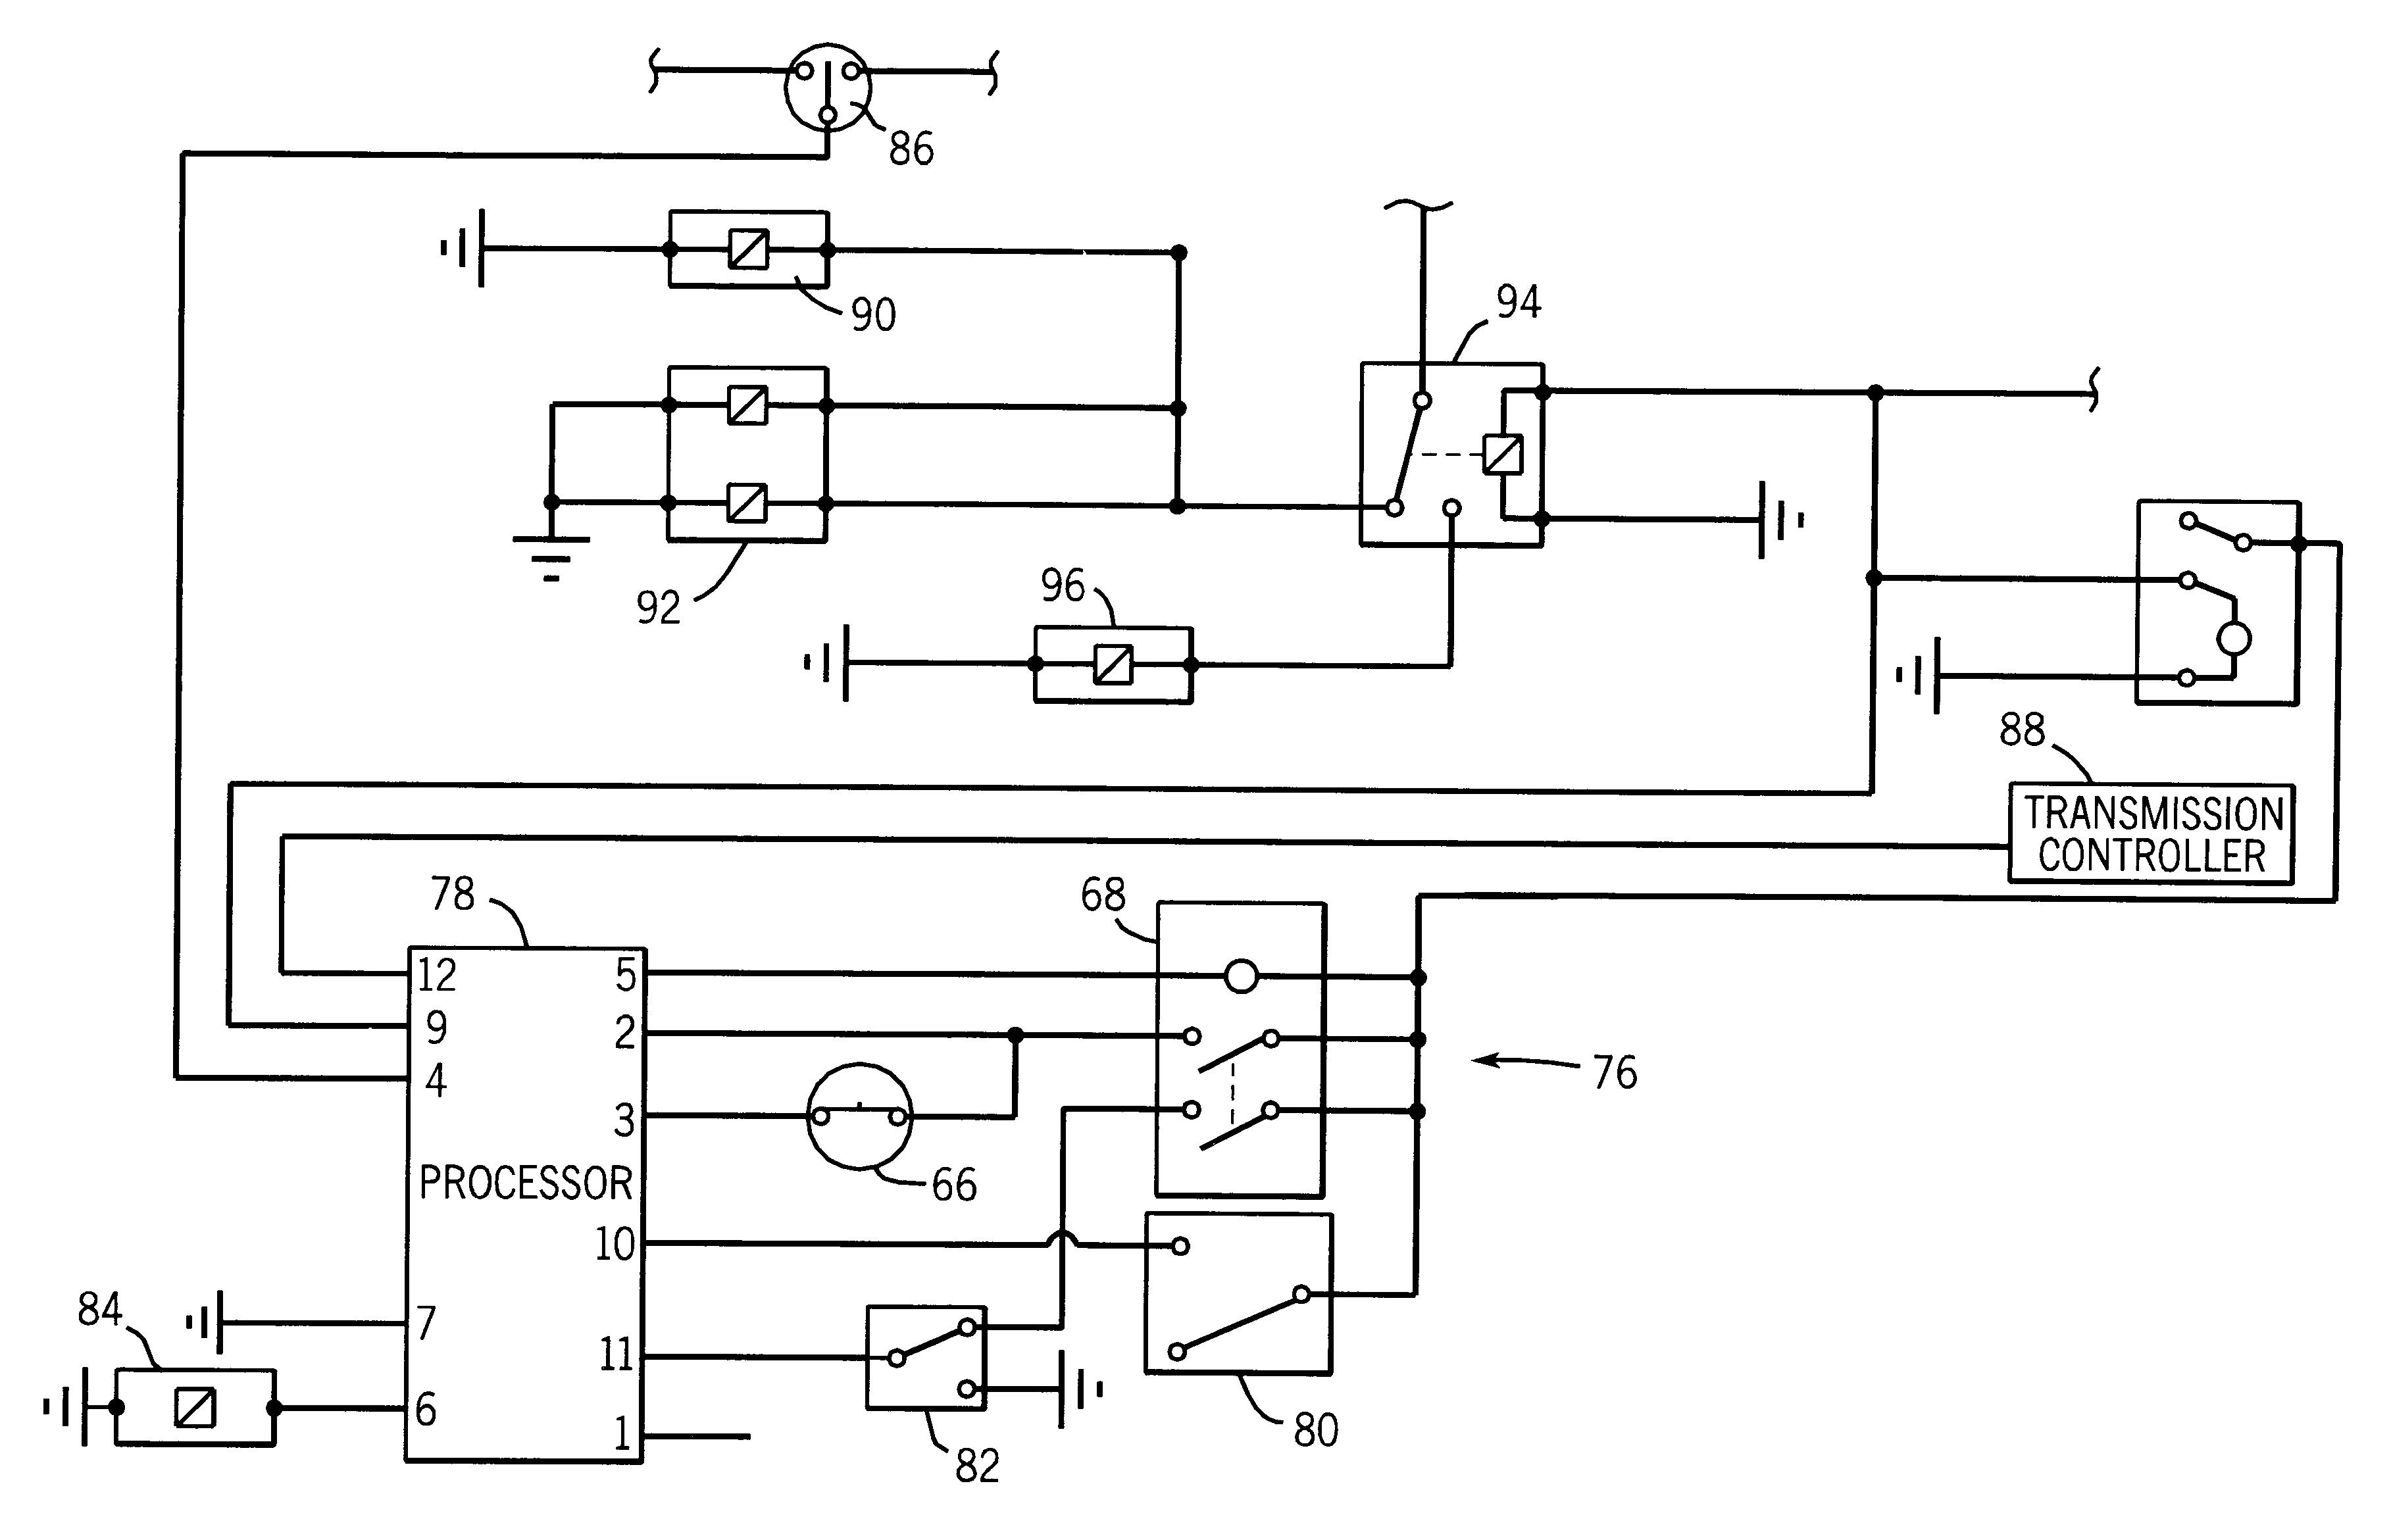 upright mx19 scissor lift wiring diagram ewiring emergency lighting ballast wiring diagram solidfonts upright mx19 schaarhoogwerkers op wielen